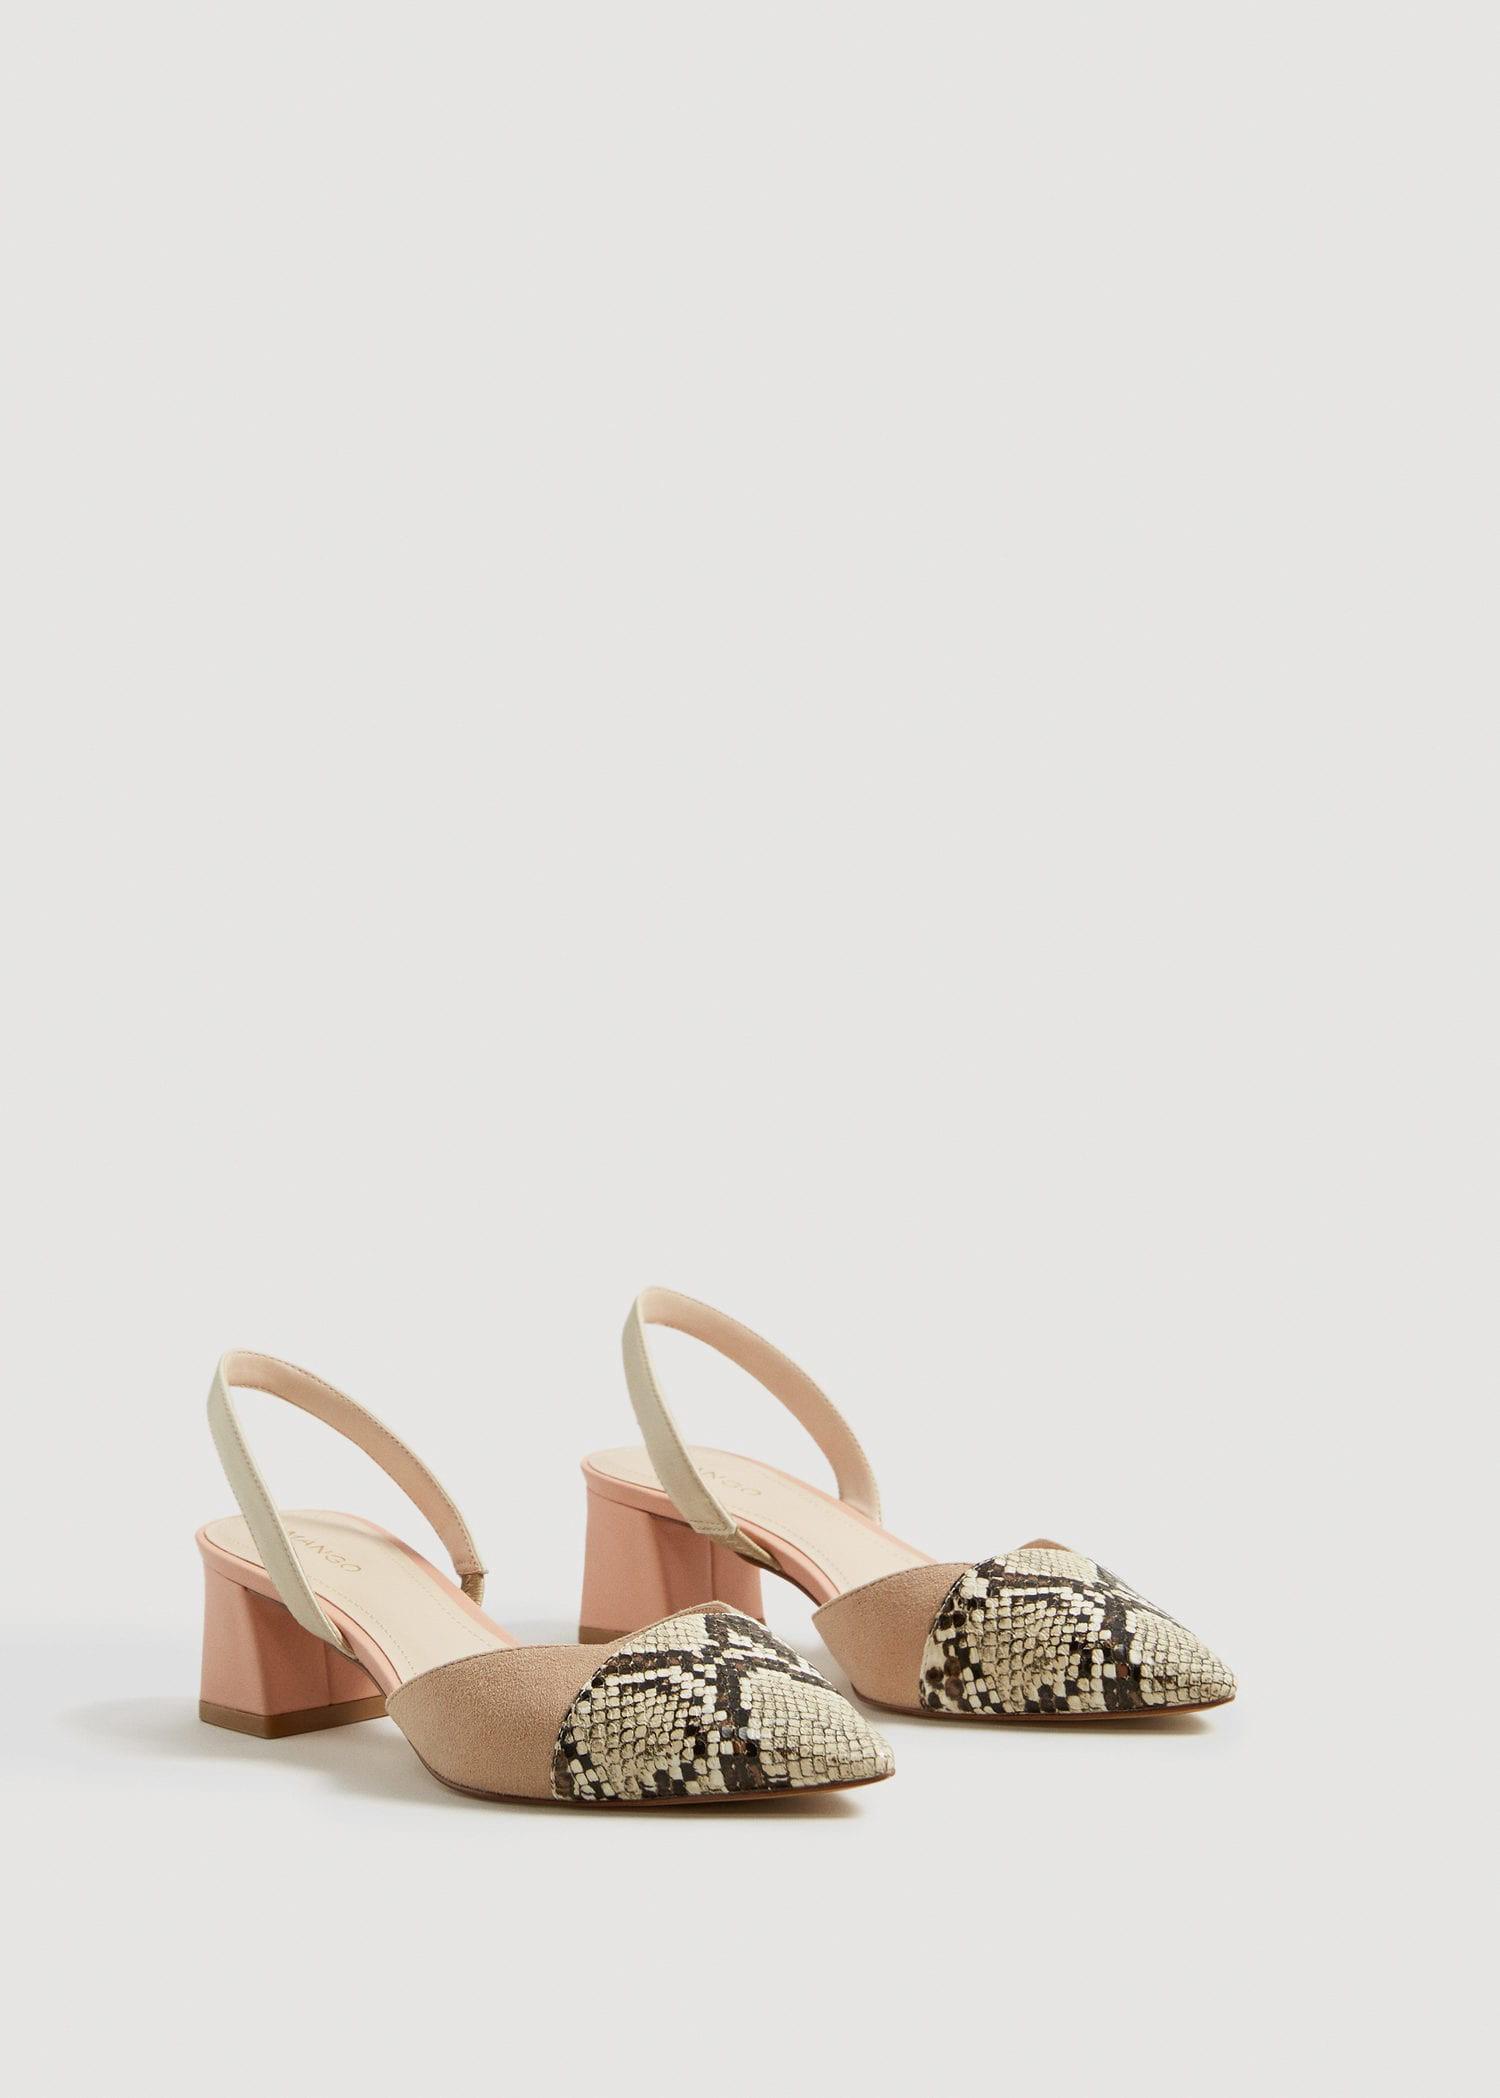 55b082b13a6366 Mango Contrast Slingback Shoes - Women